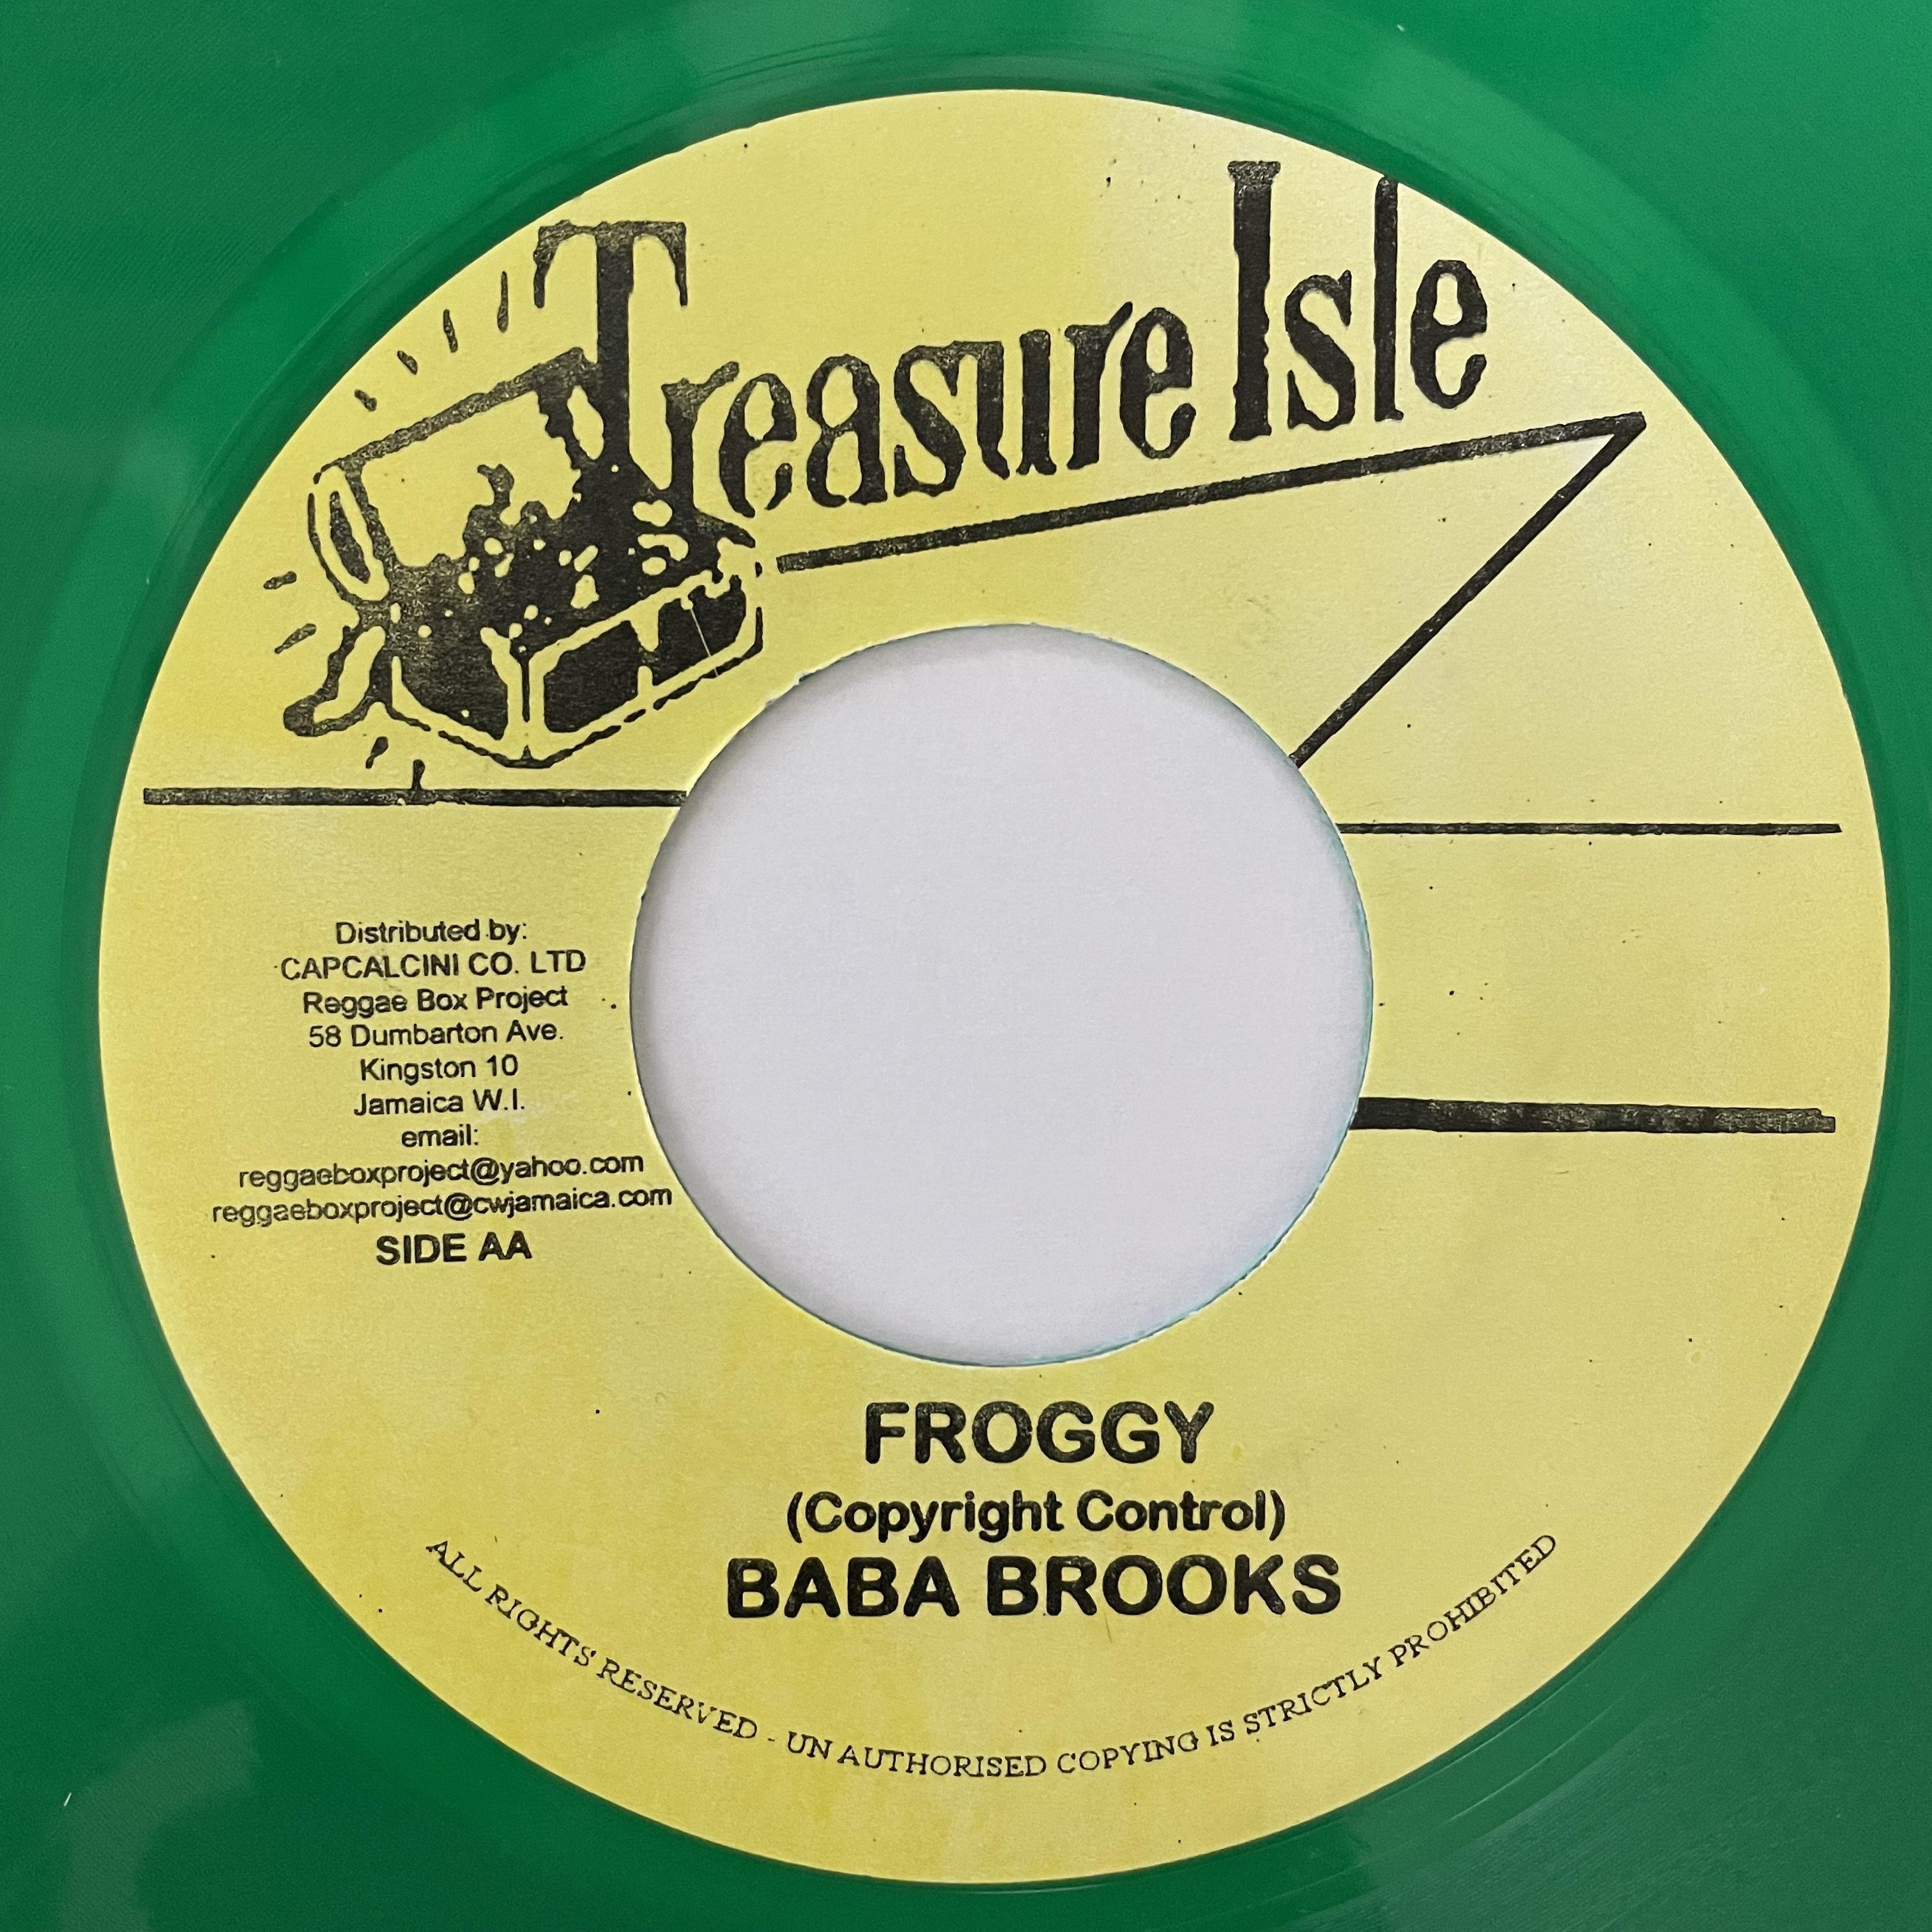 Baba Brooks - Froggy【7-20750】